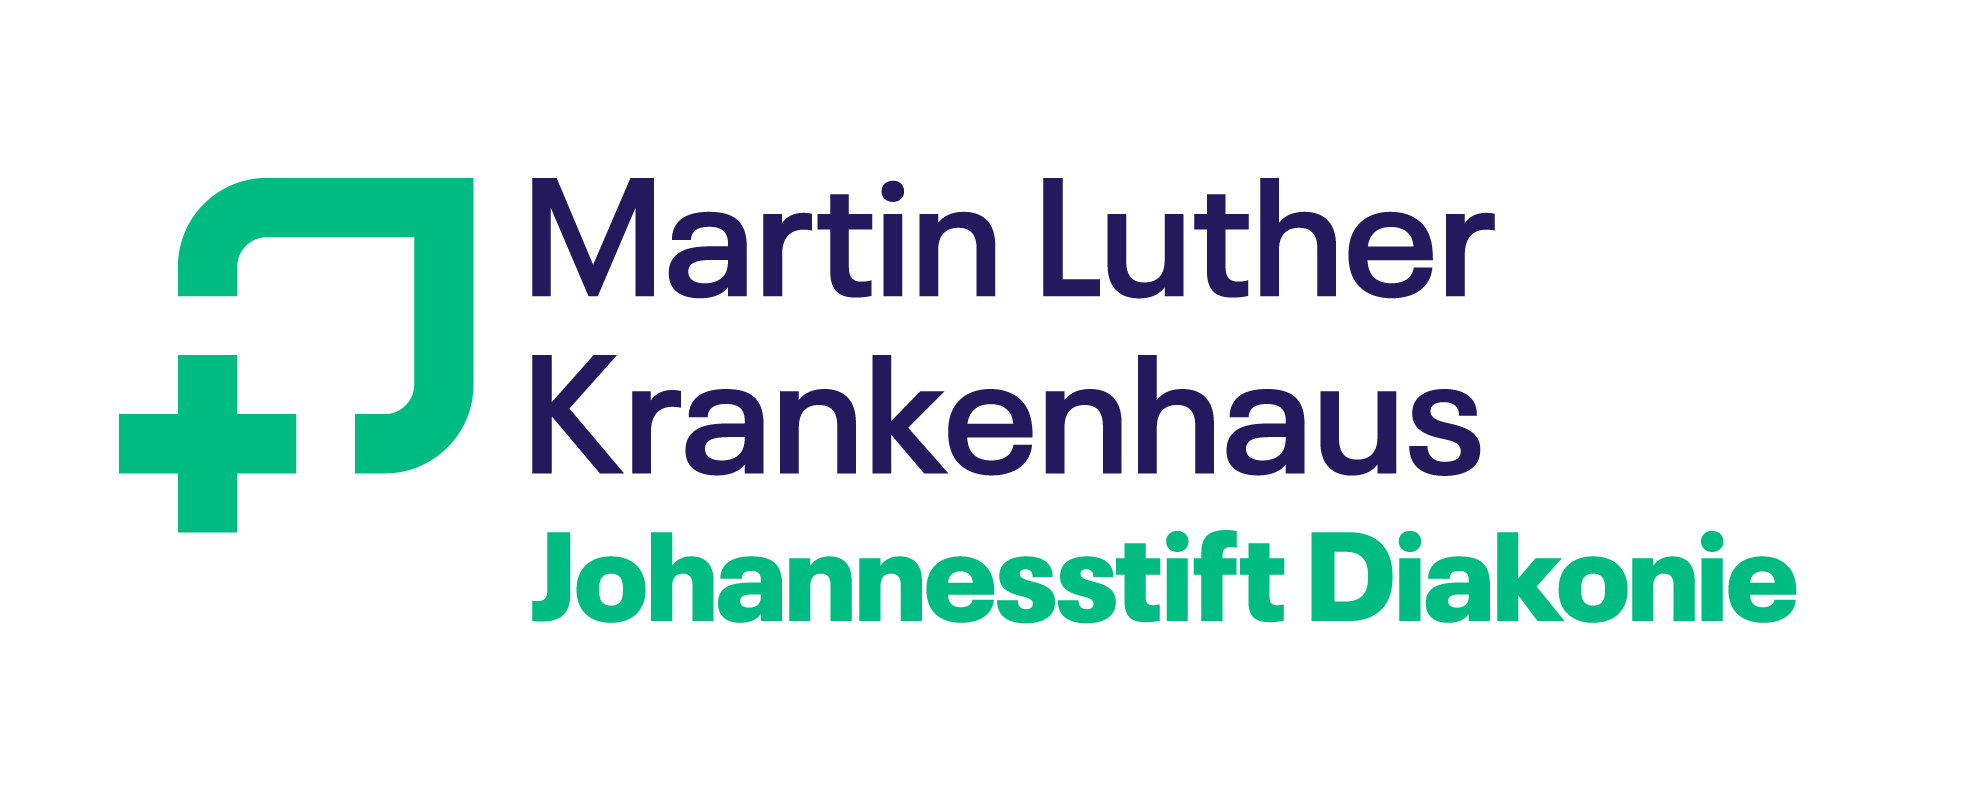 Logo: Martin Luther Krankenhaus